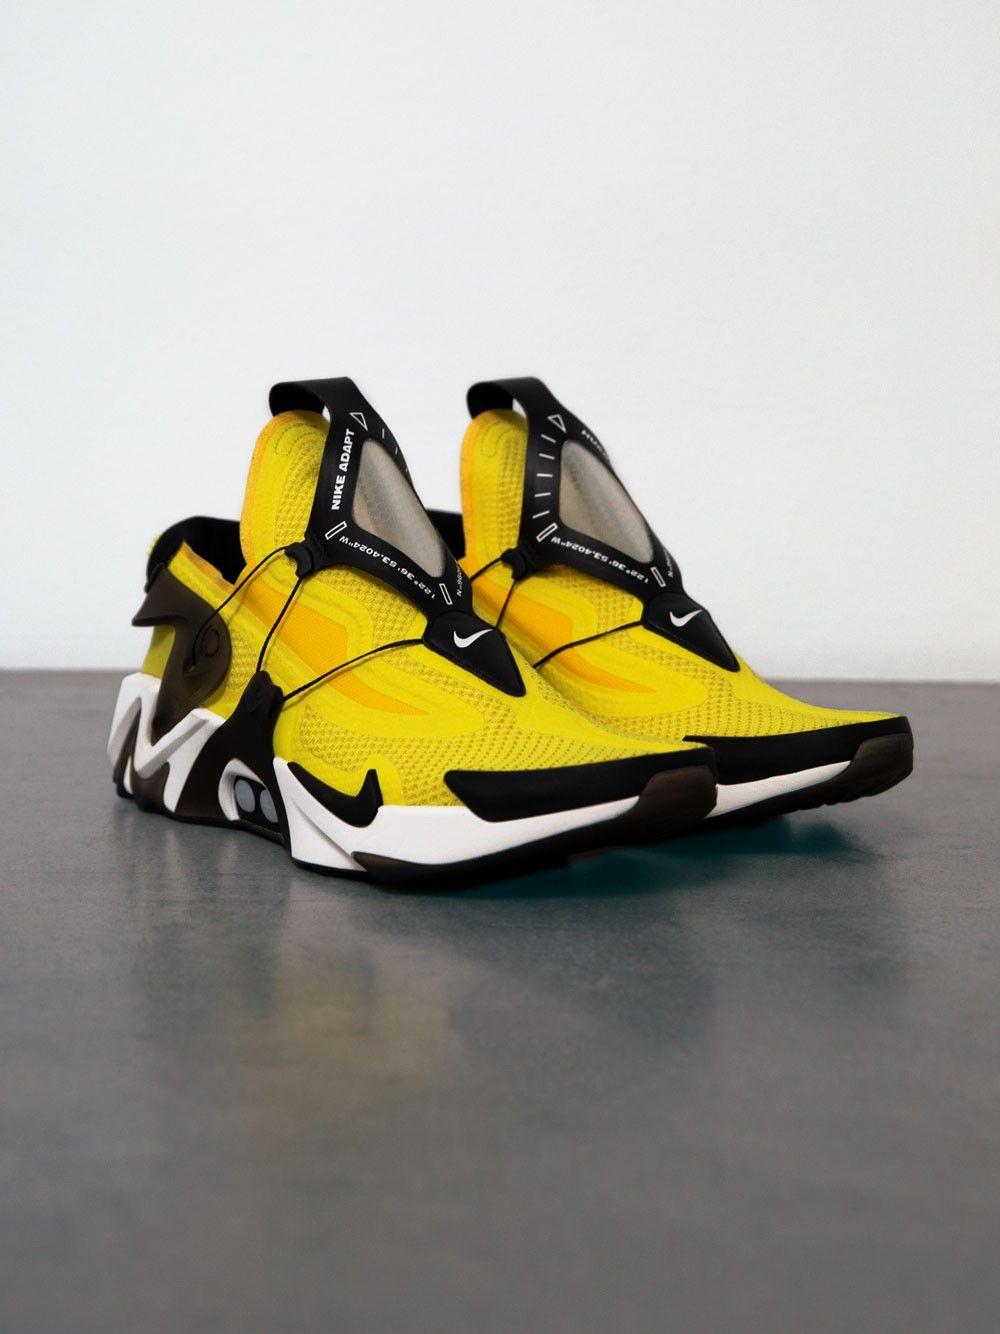 Nike Adapt Huarache: How & Where to Buy Today | Zapatillas